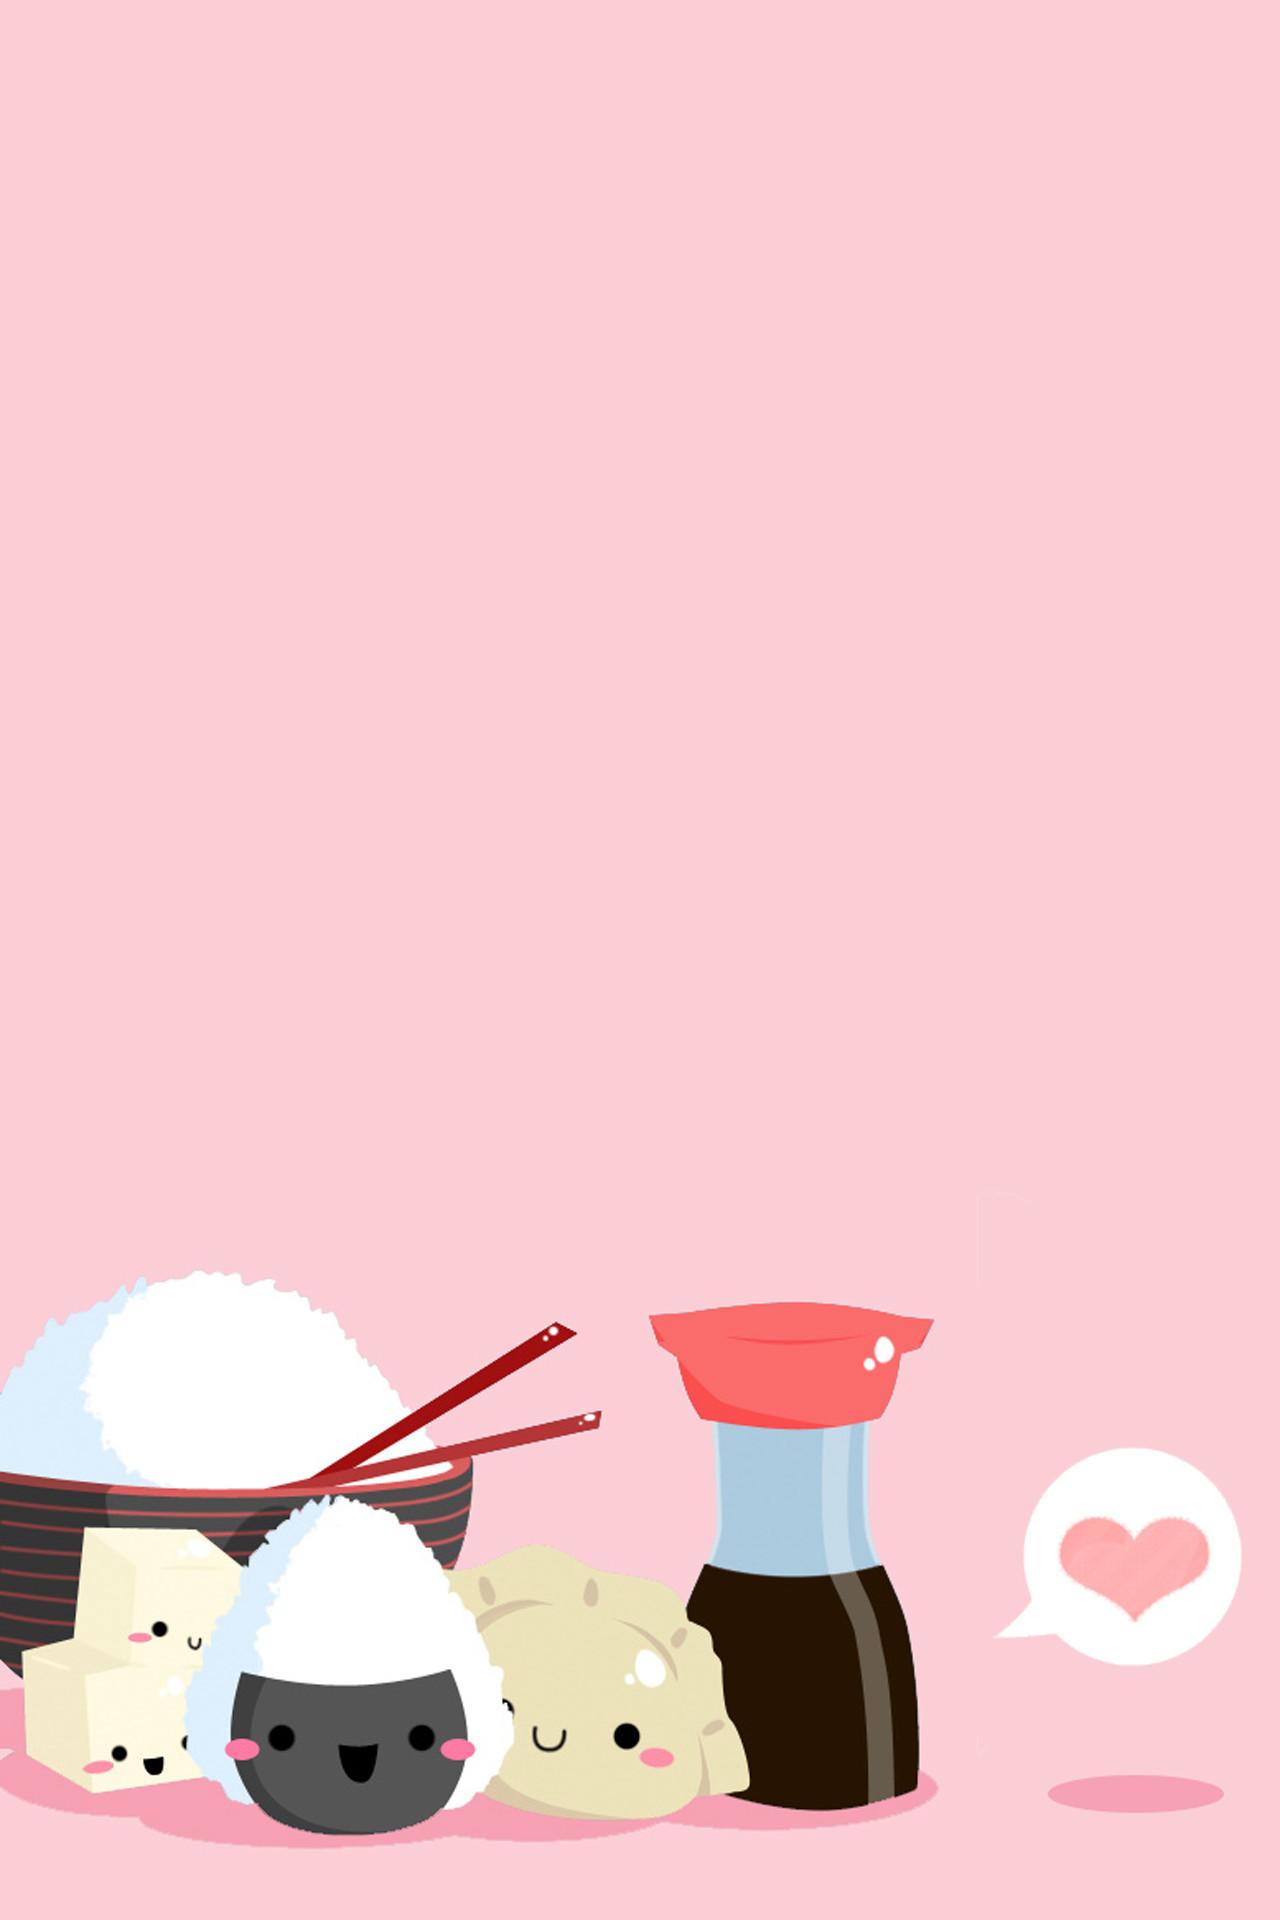 Explore Kawaii Wallpaper, Wallpaper For Iphone, and more!